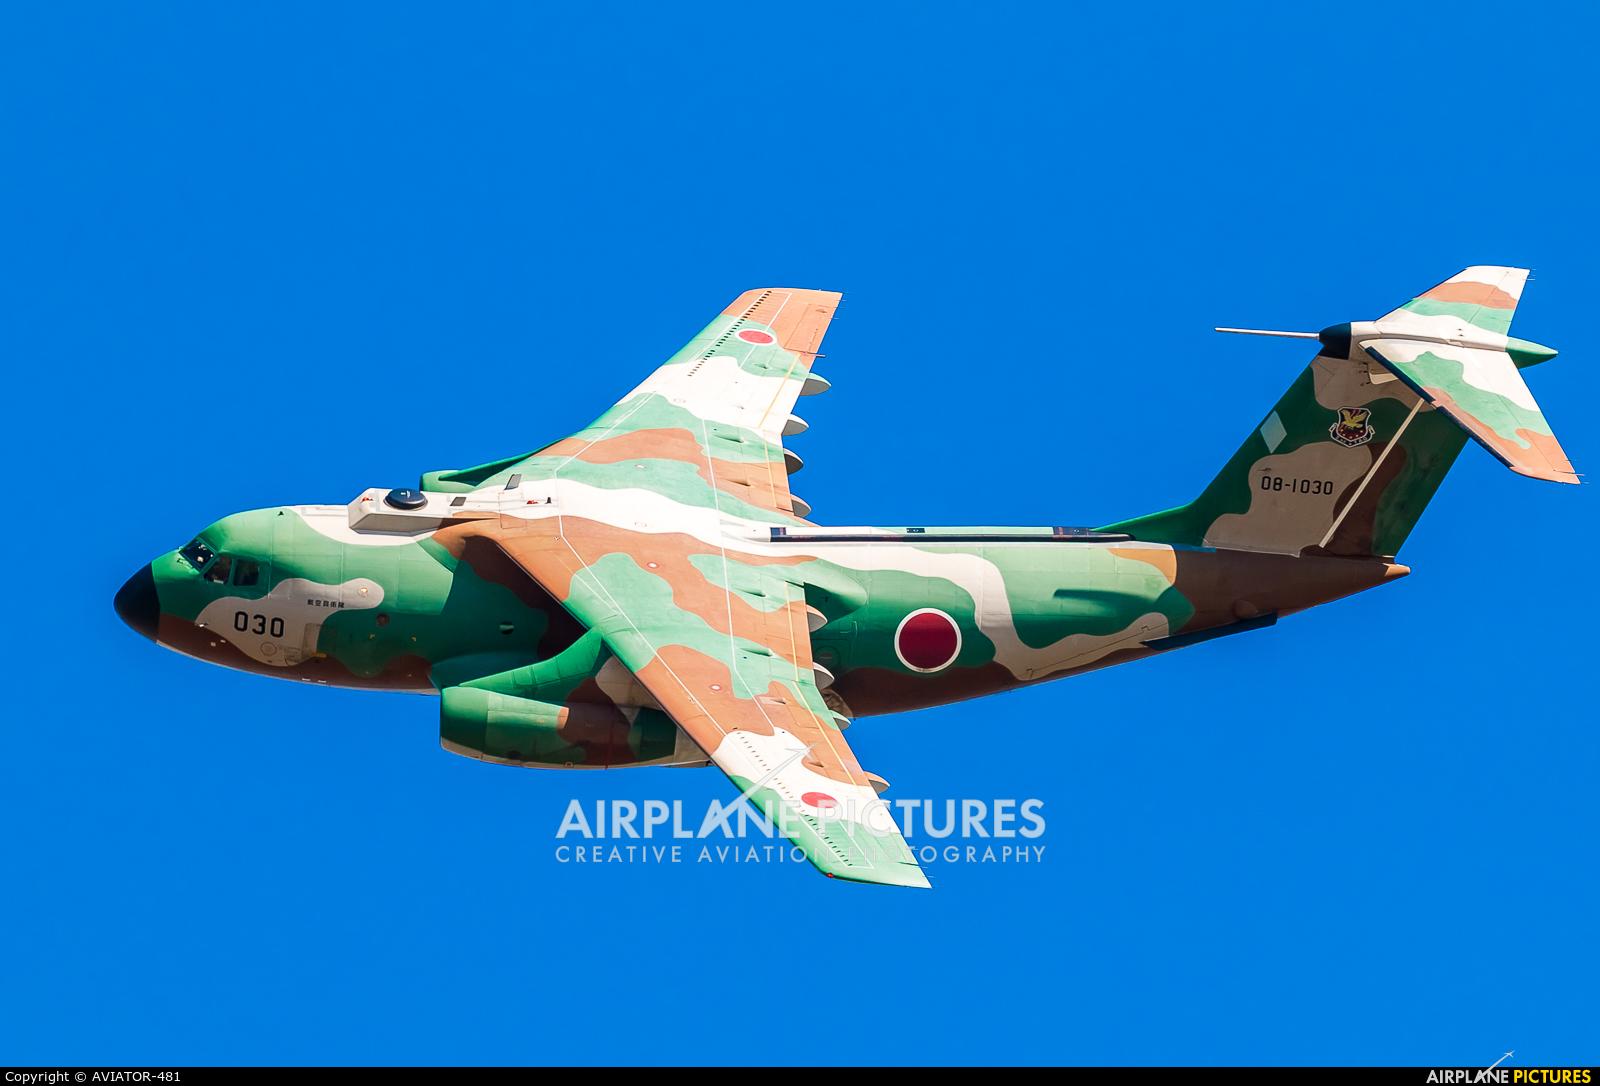 Japan - Air Self Defence Force 08-1030 aircraft at Iruma AB